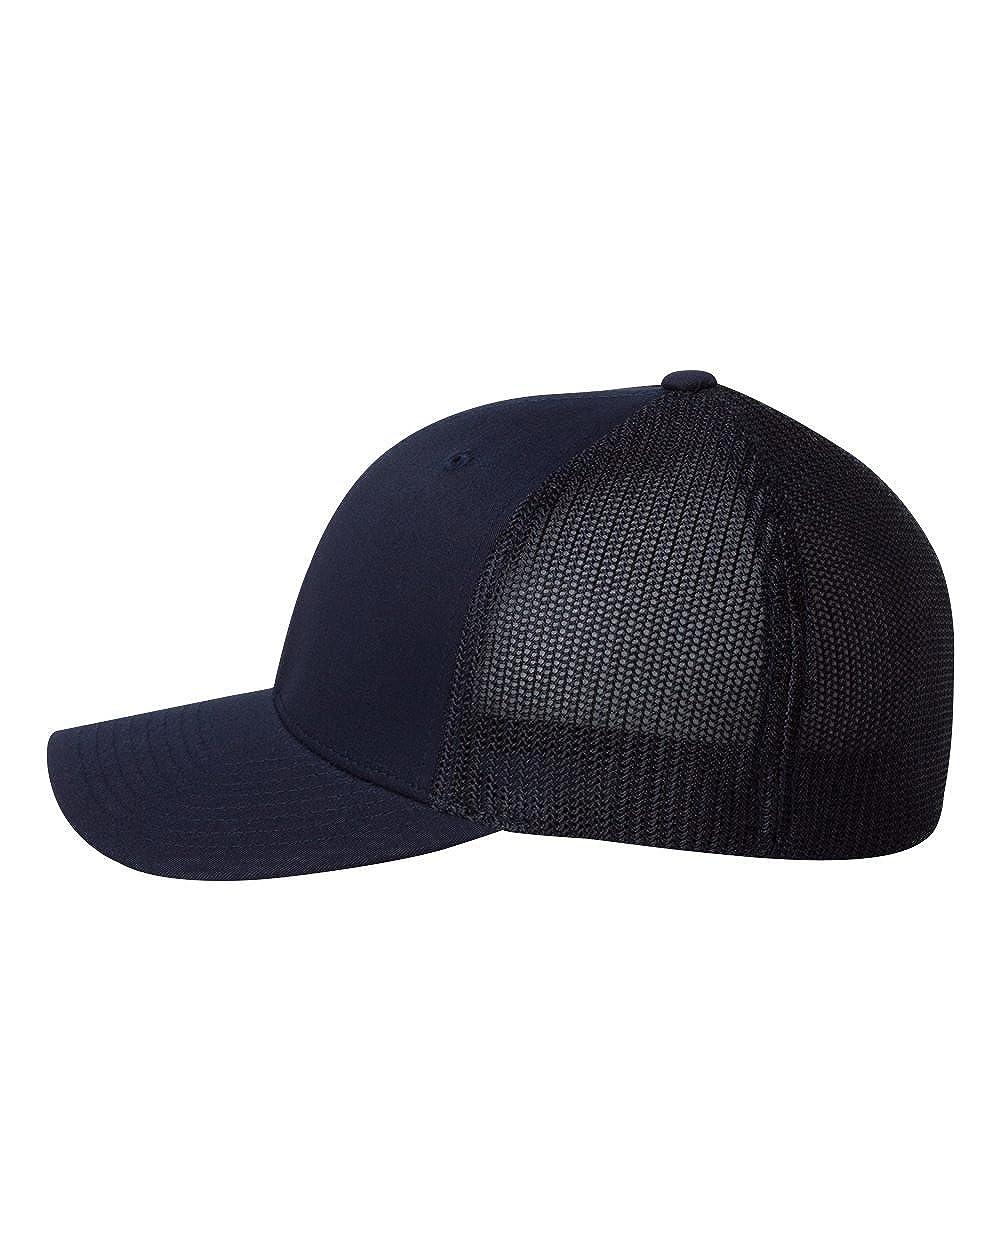 6511 Flexfit Mesh Cotton Twill Trucker Cap